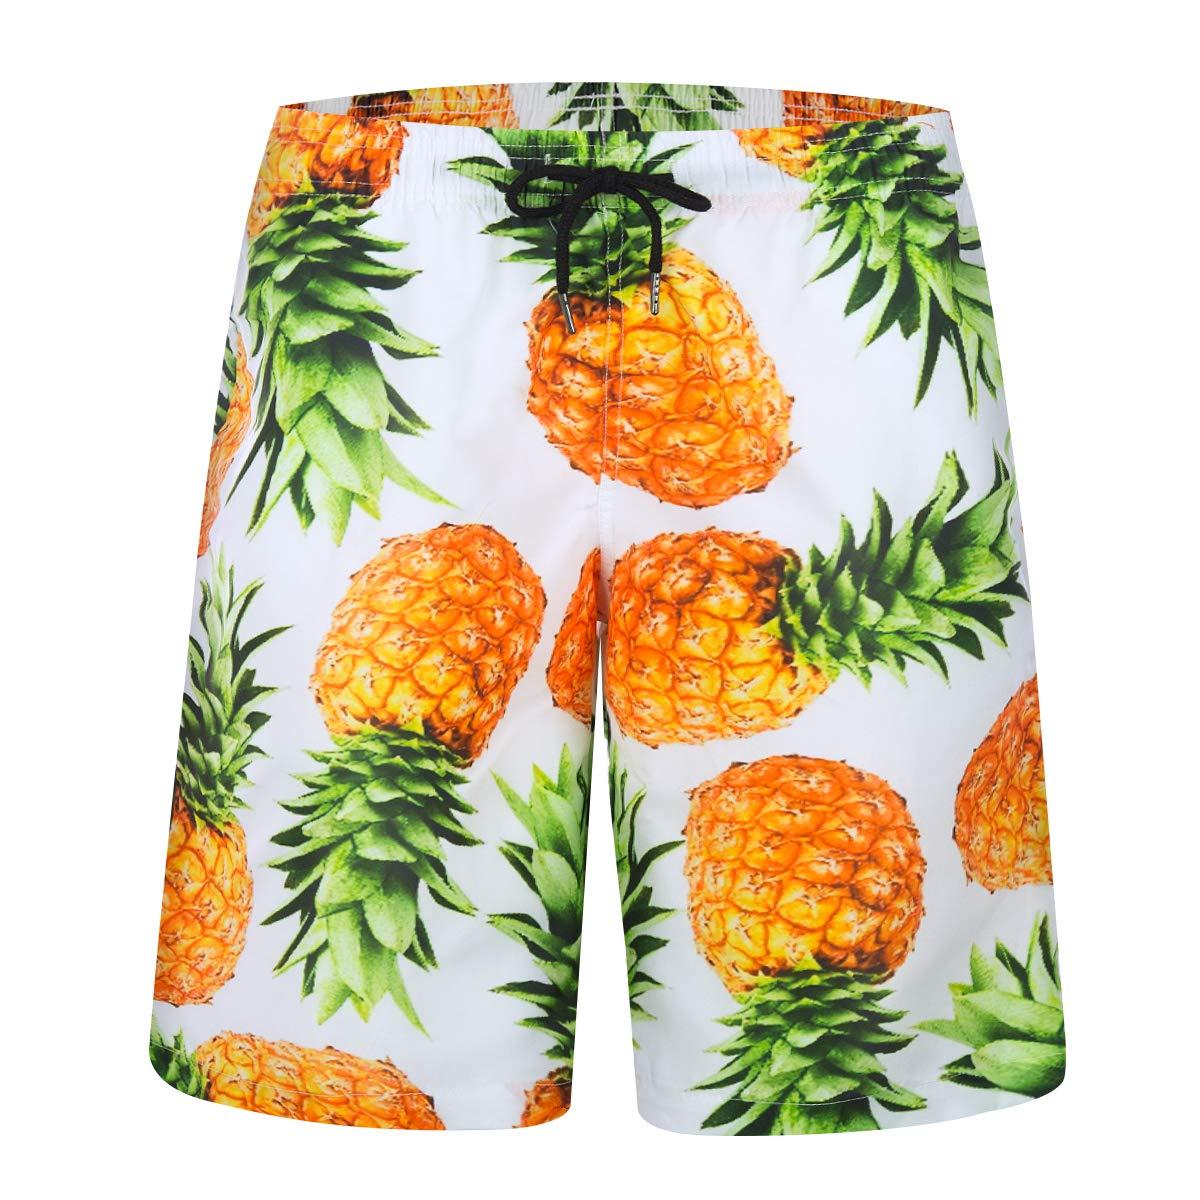 iCKER Mens Swim Trunks Quick Dry Beach Holiday Party Swim Board Shorts